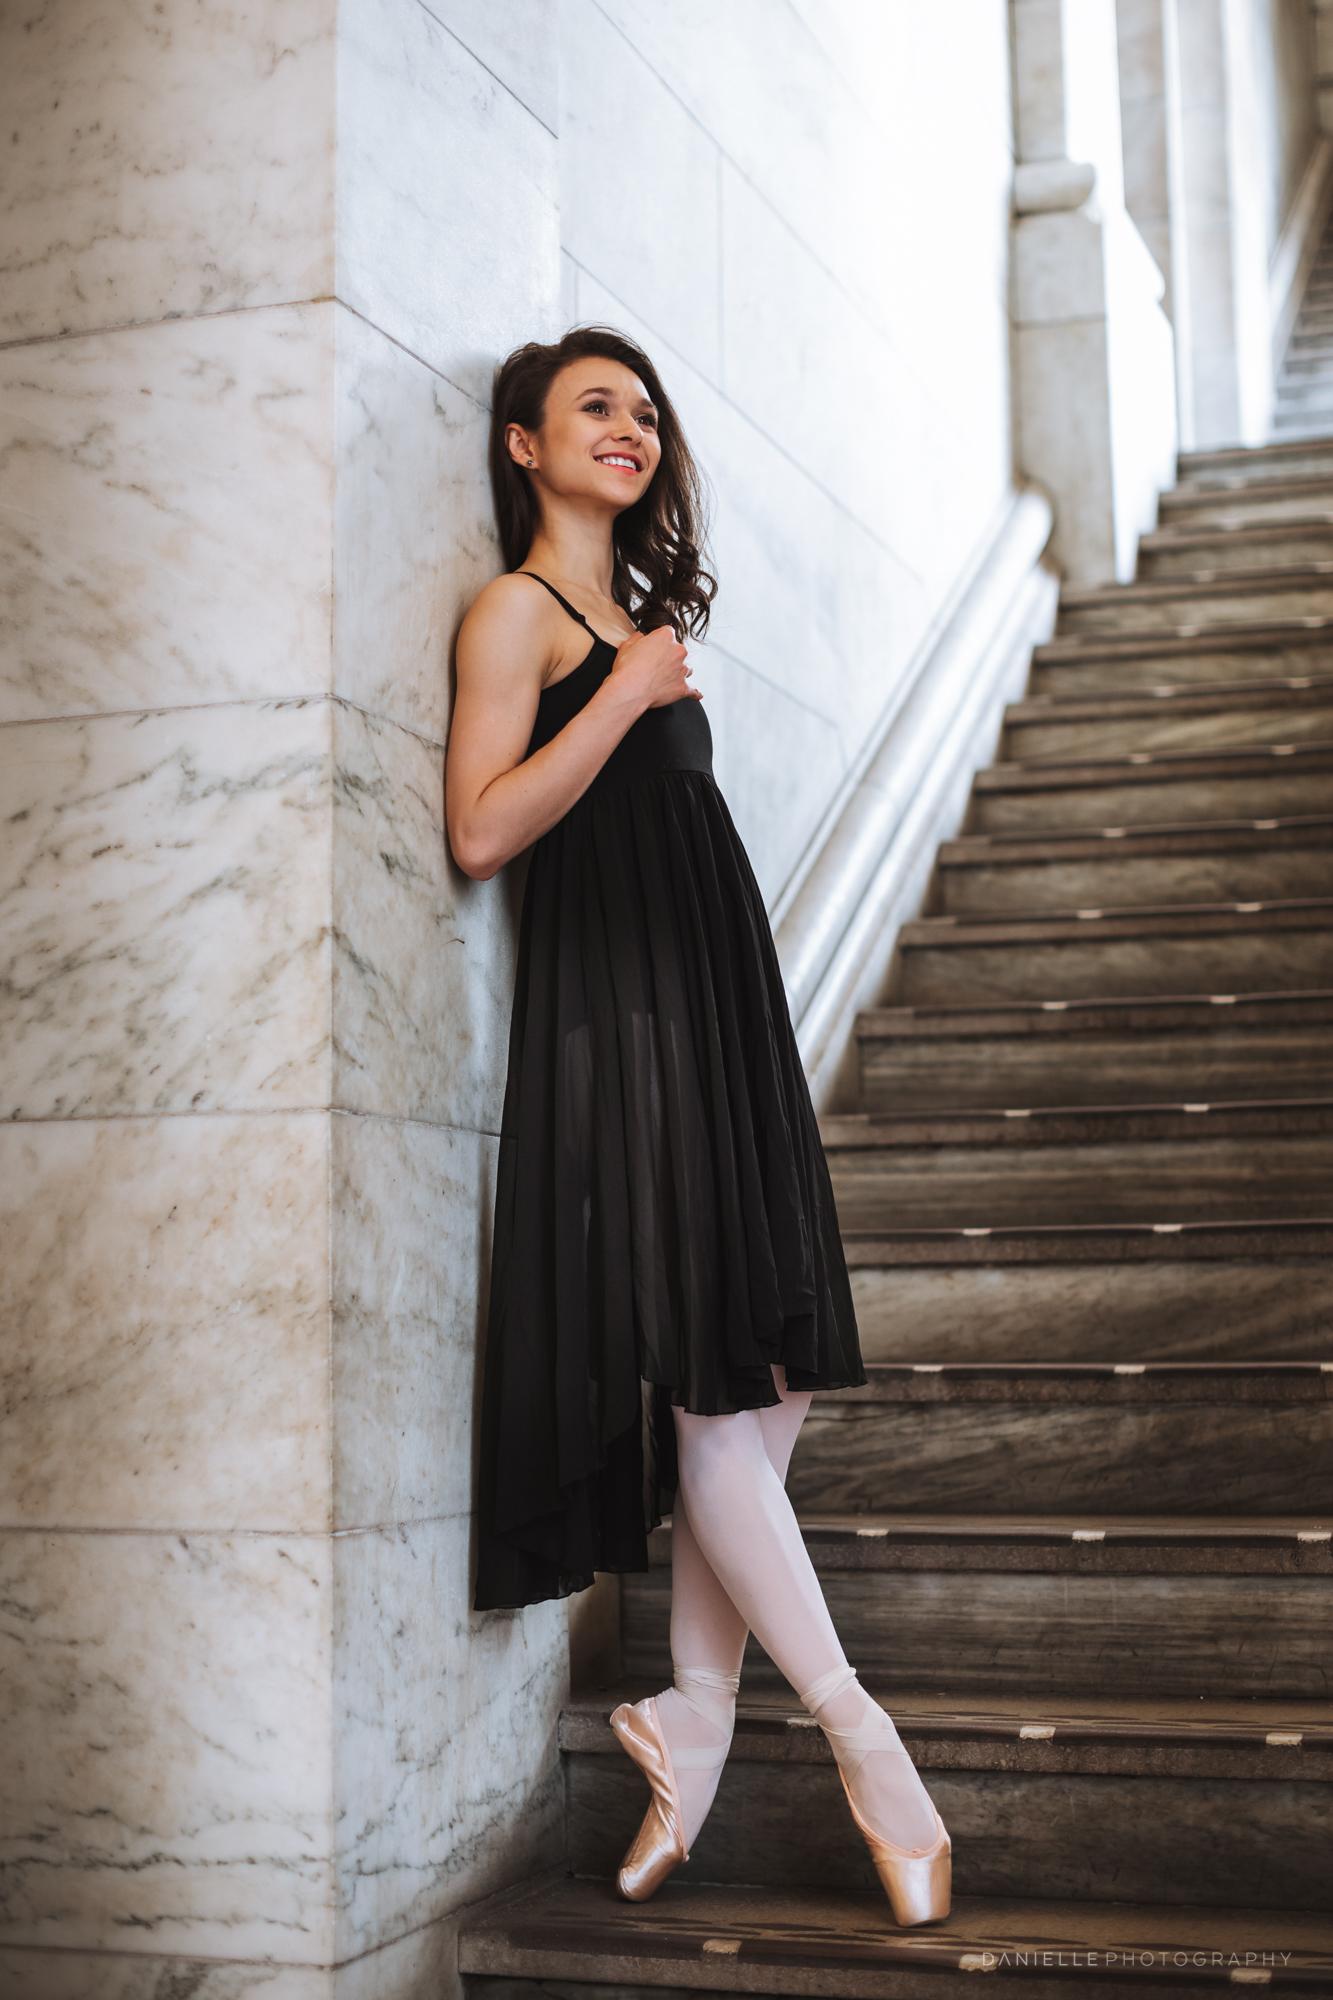 @DaniellePhotographySA_Ballerina_Photoshoot_NYPL-23-12.jpg